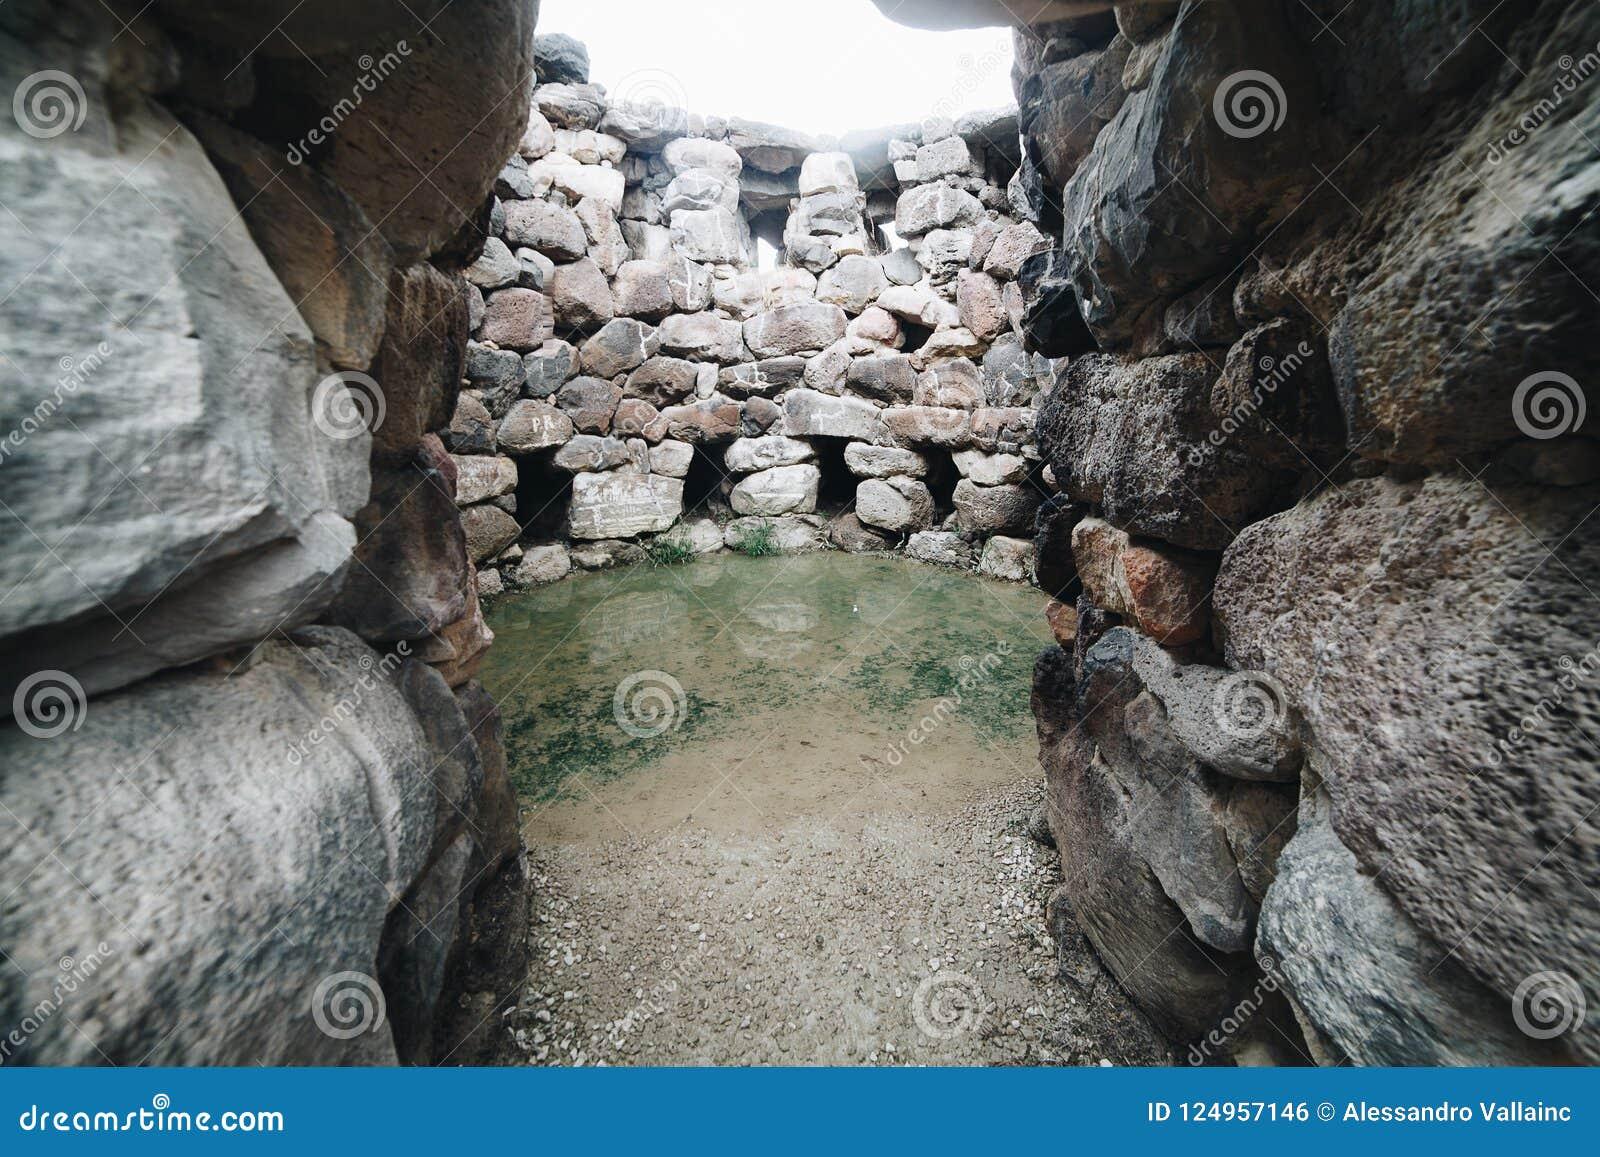 Nuraghe Su Nuraxi入口在巴鲁米尼,撒丁岛,意大利 考古学nuragic复合体看法